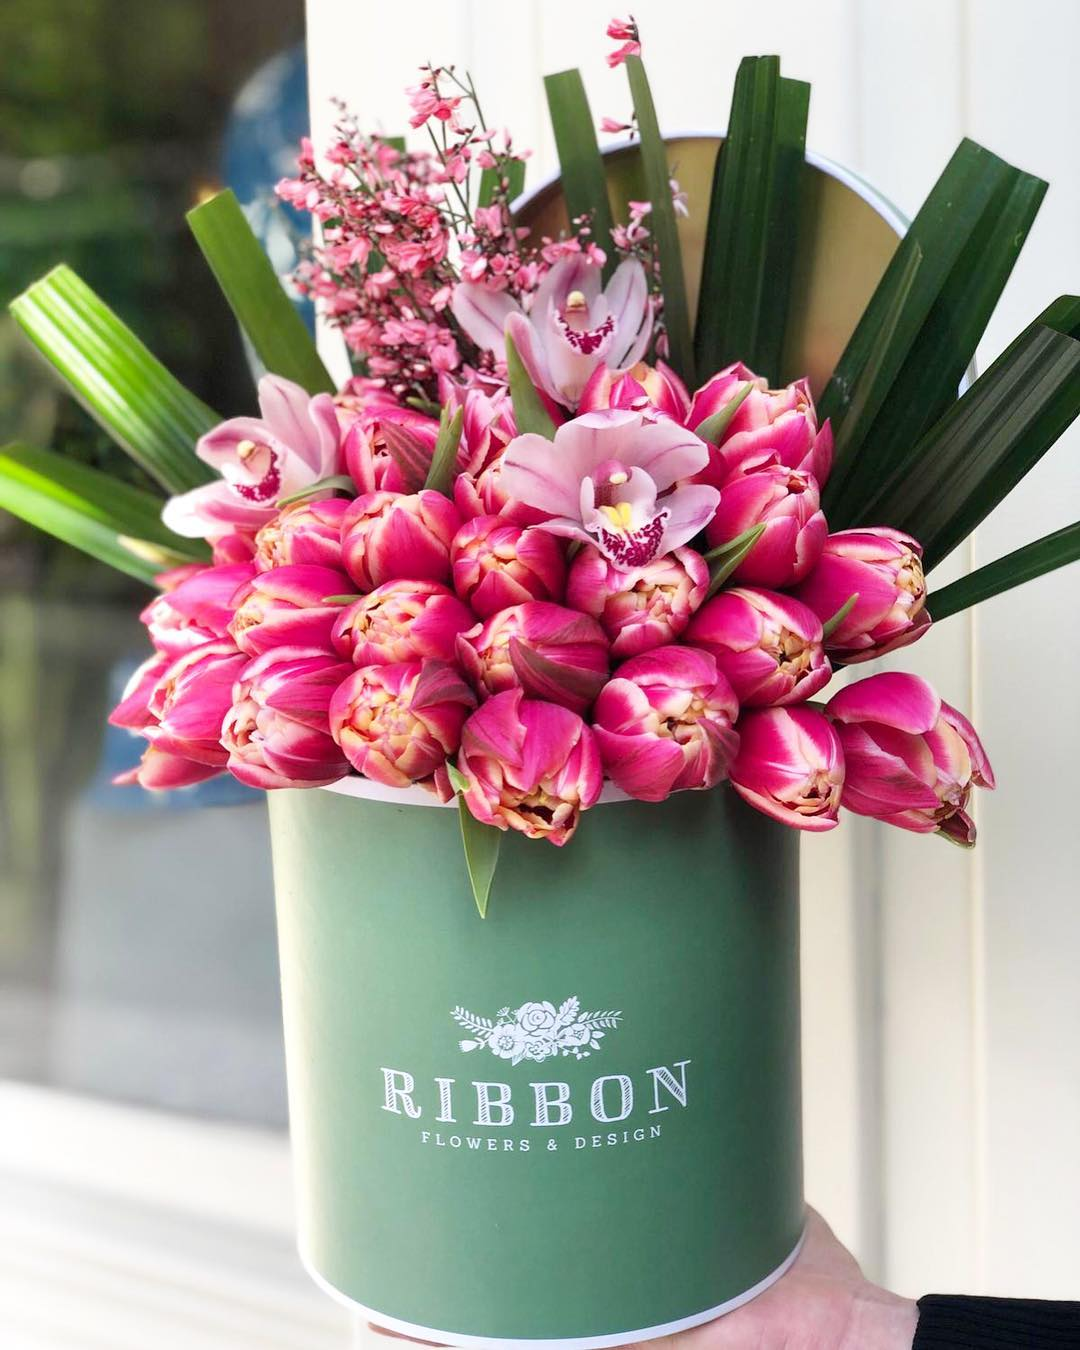 RIBBON Flowers & Design